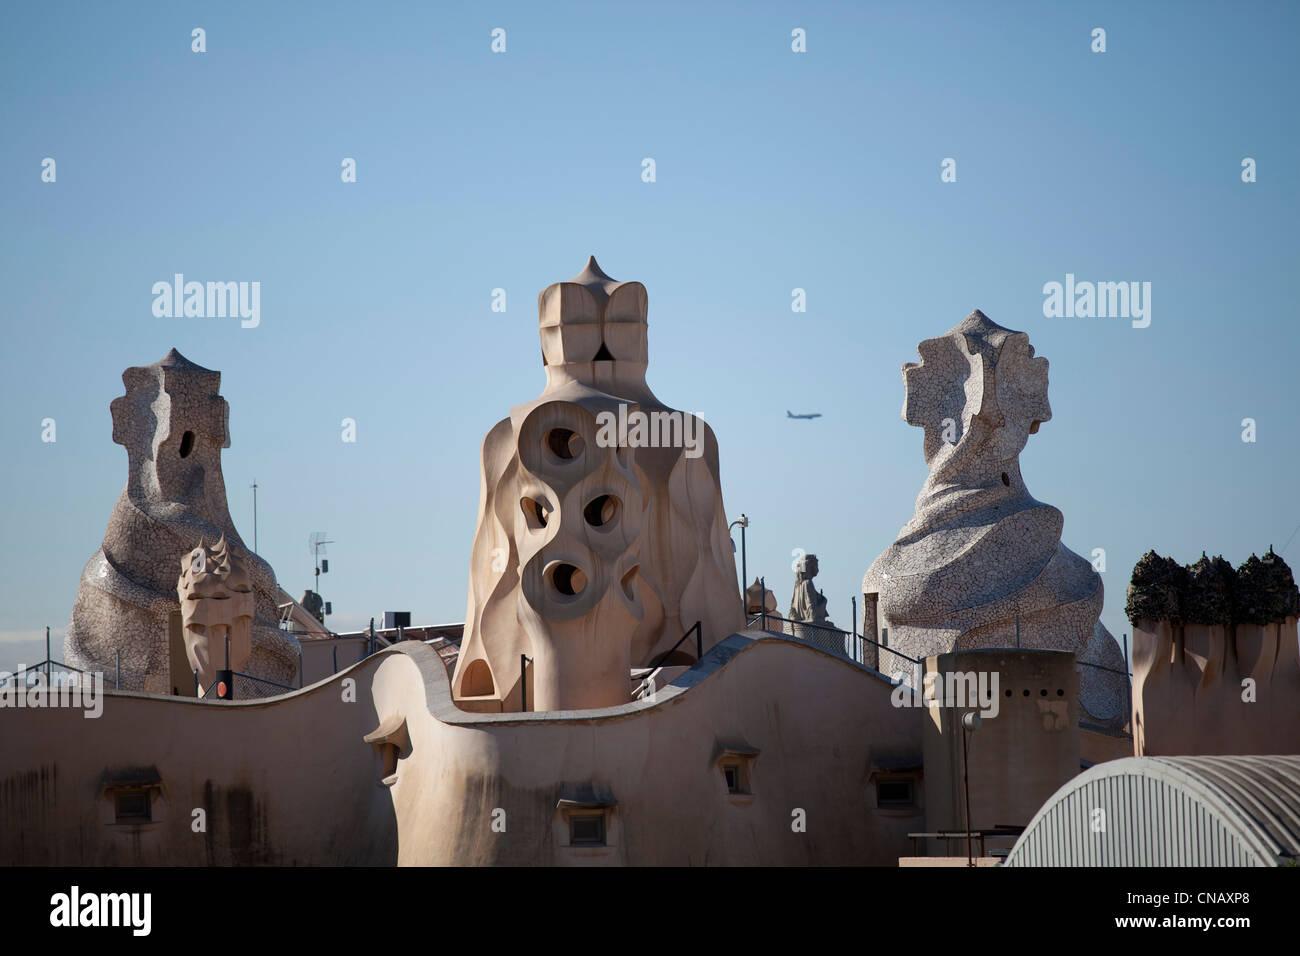 Rooftop of Gaudi building - Stock Image